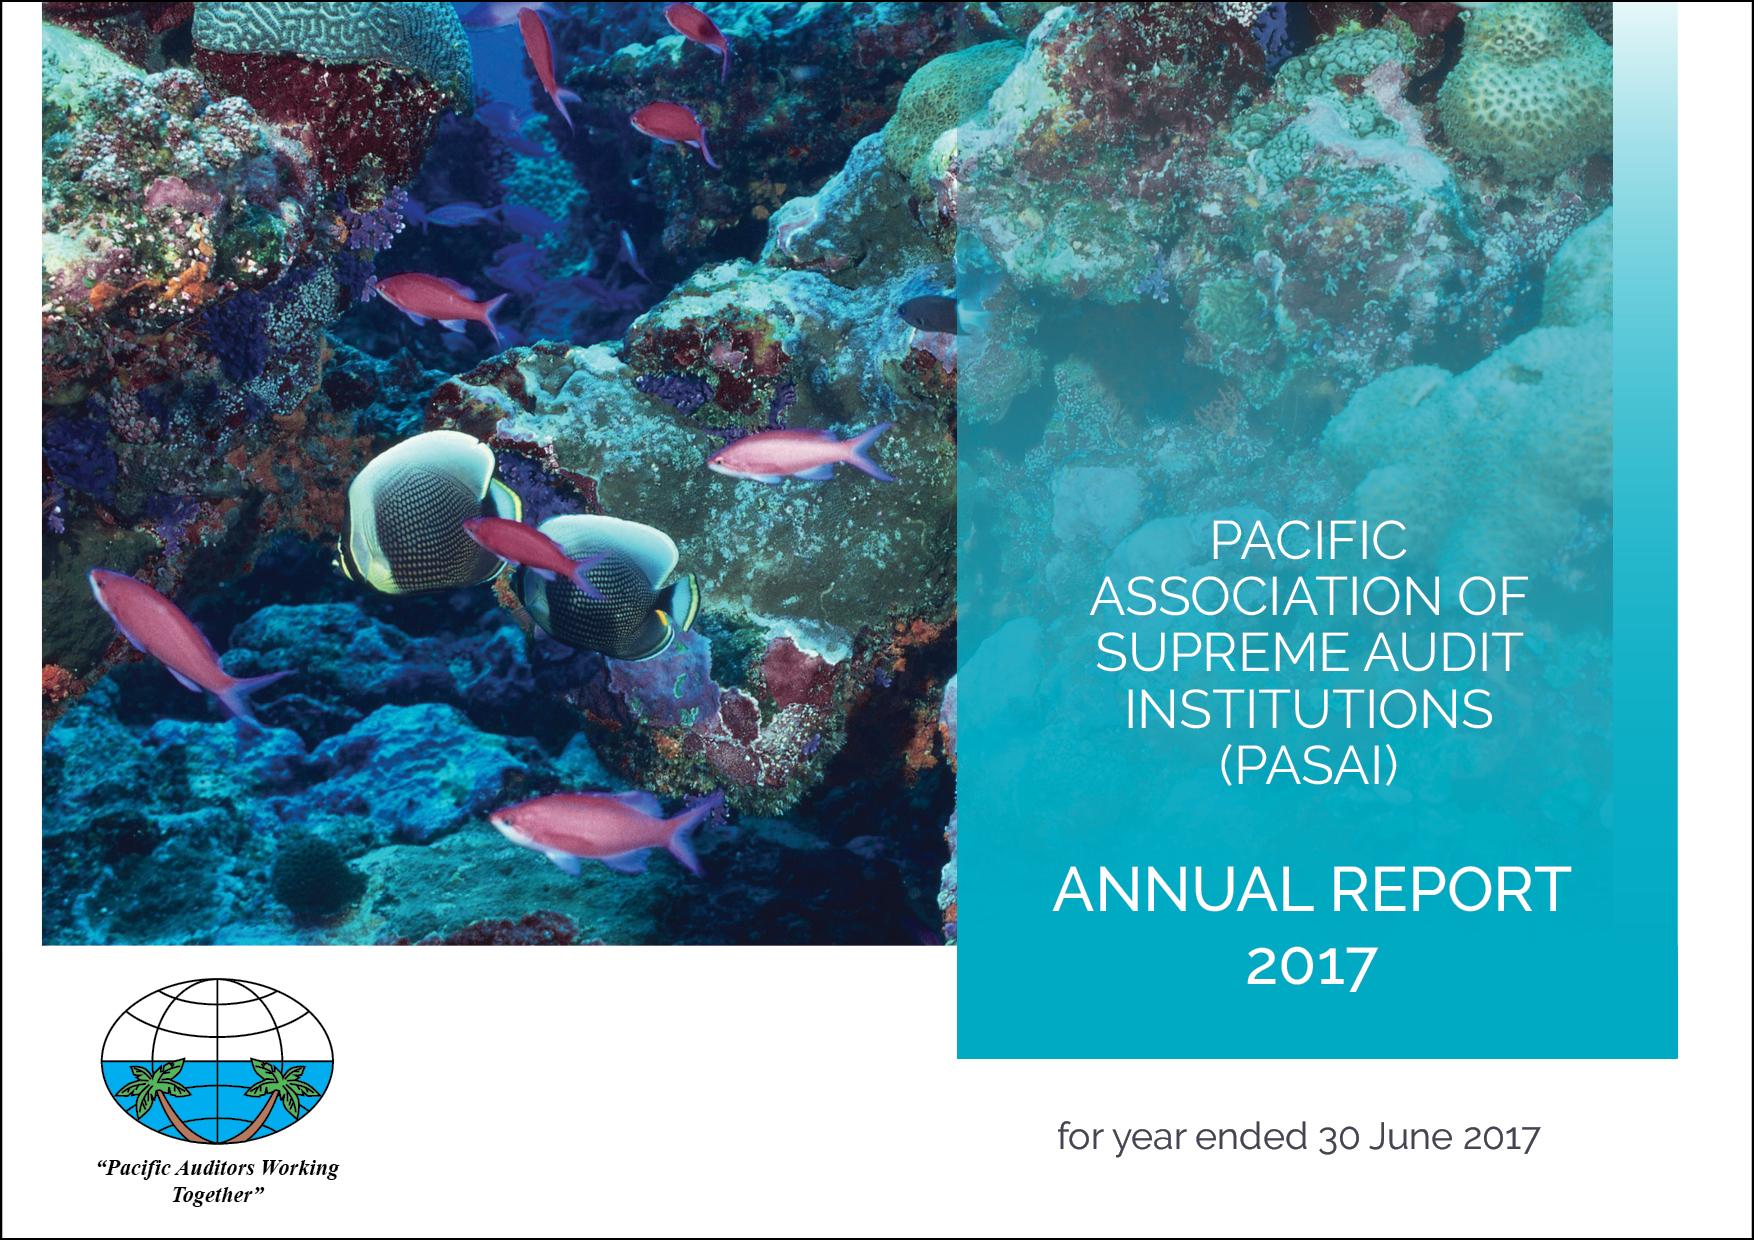 PASAI Annual Report 2017 COVER.jpg